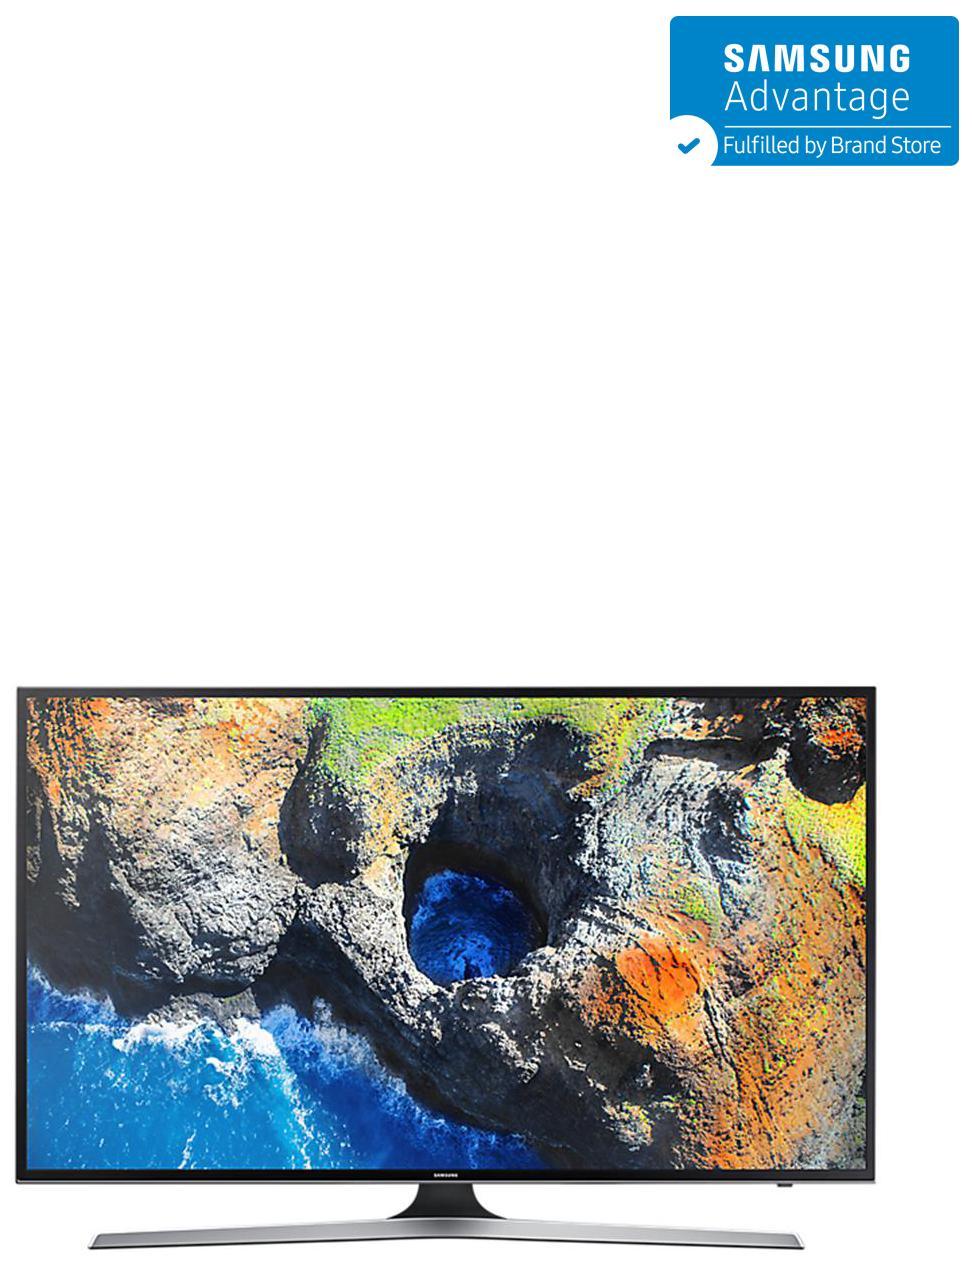 Hp Deskjet 1112 K7b87d Printer Daftar Harga Terlengkap Indonesia Putih Single Function Inkjet